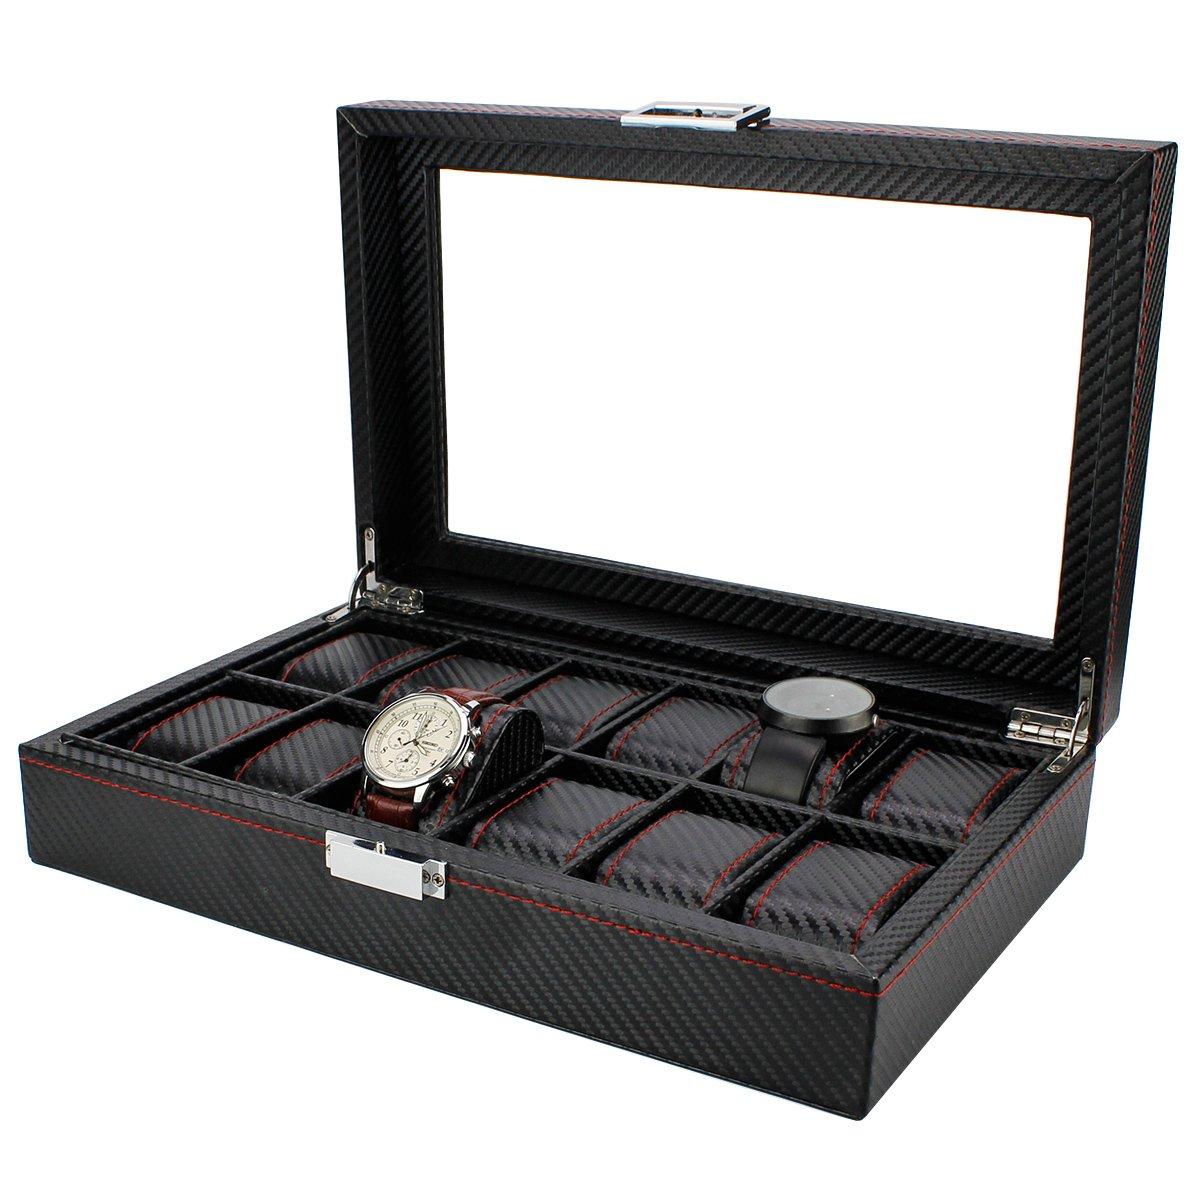 Ezeso WatchコレクションジュエリーTieボックスPUレザーカーボンファイバー表示ストレージケース EzesoSKU009631USU0069 B01MR3B00PWatch Collection Box